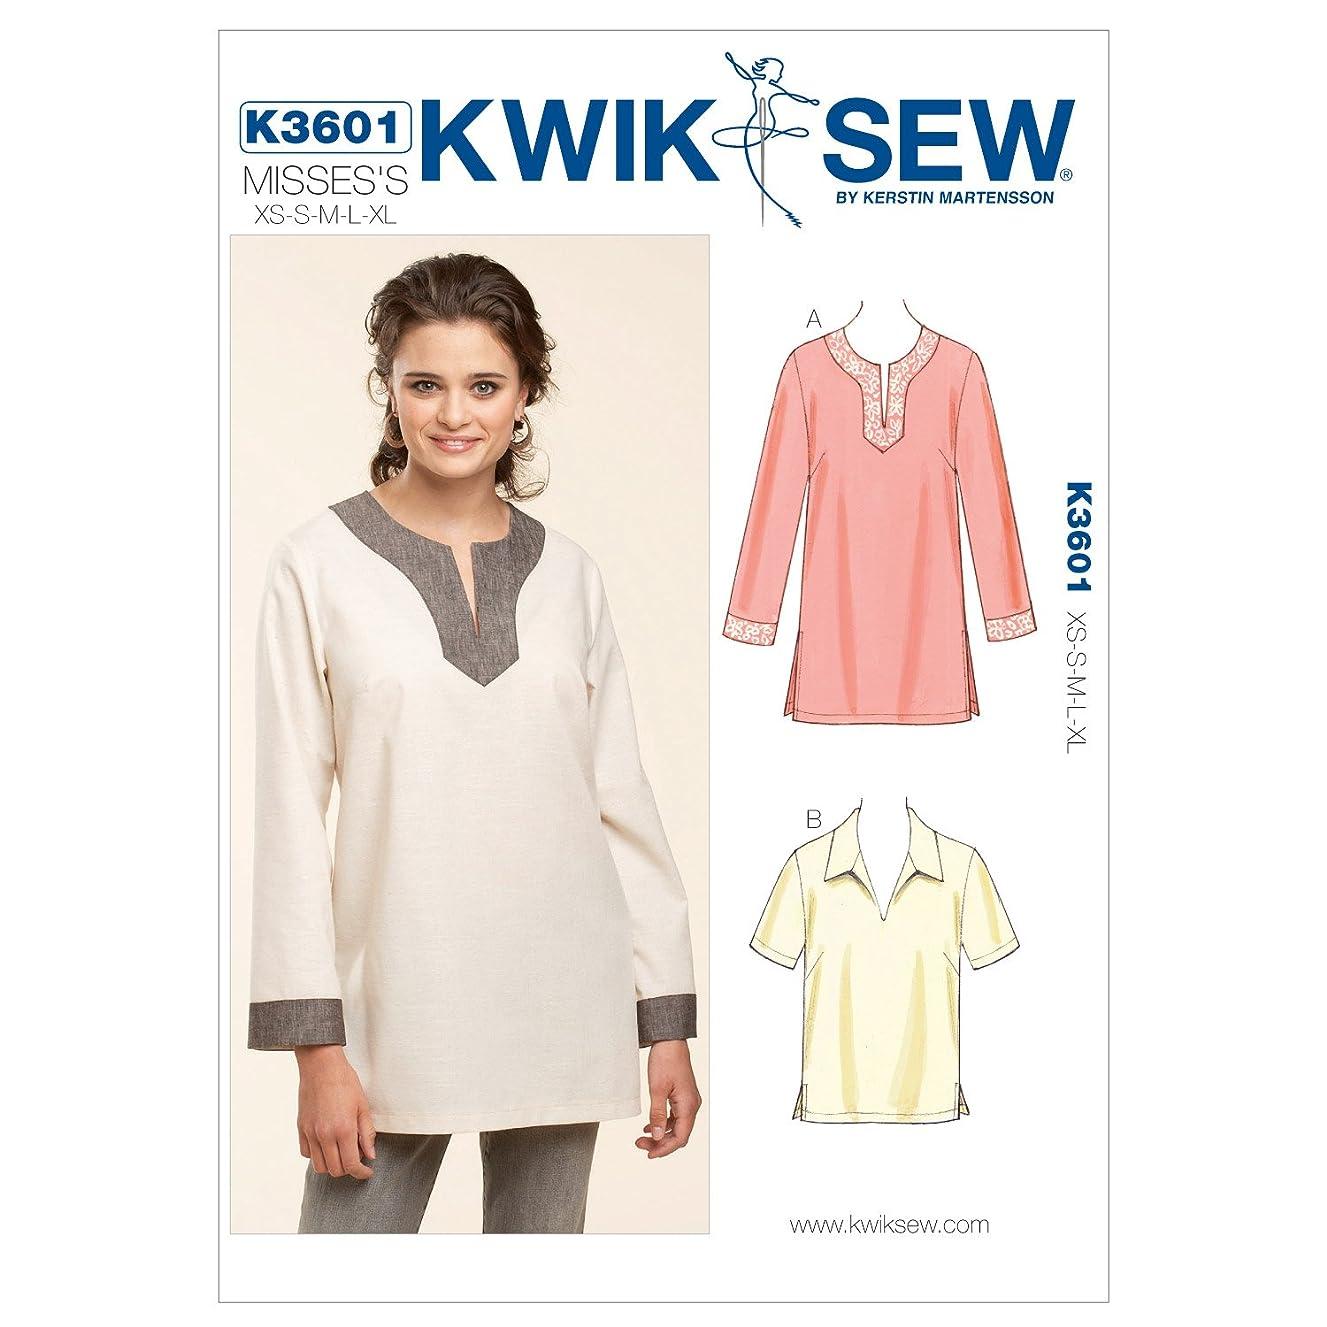 Kwik Sew K3601 Pull-Over Tops Sewing Pattern, Size XS-S-M-L-XL